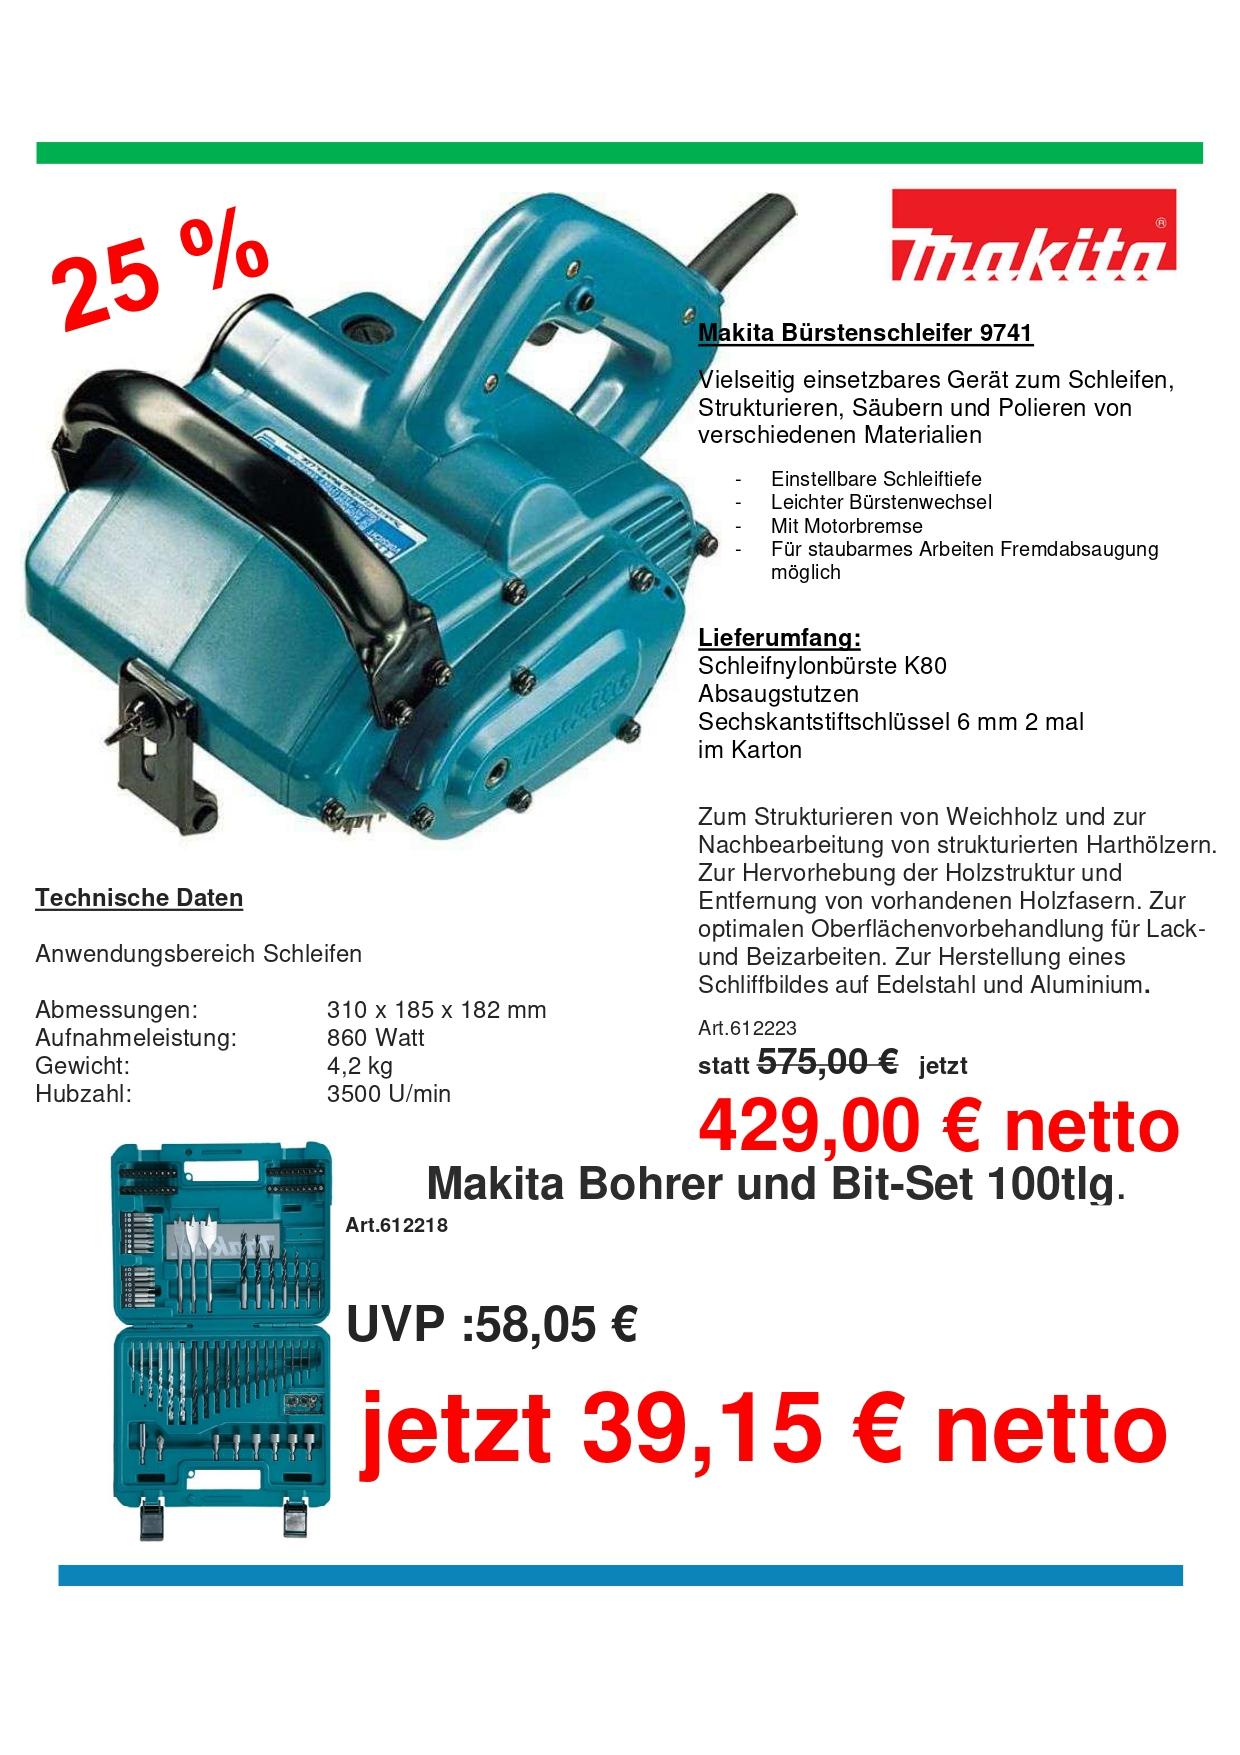 Festool Makita Aktion solange verfügbar 2_pages-to-jpg-0001